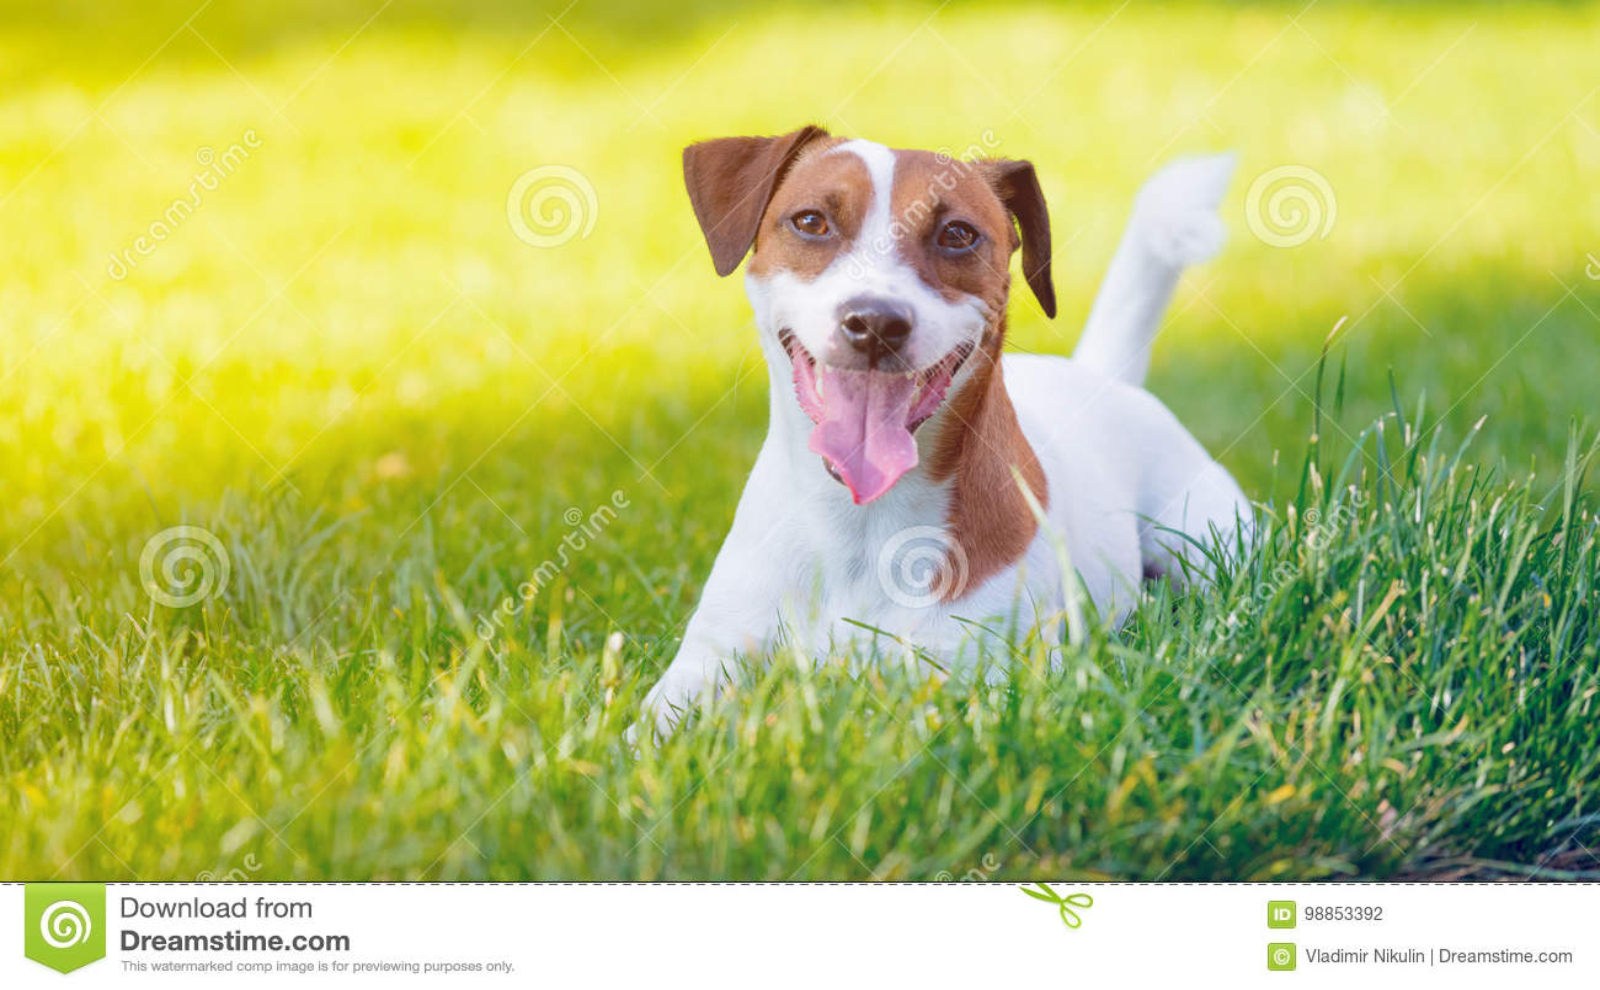 Walking Dog Clean Up Diarrhea